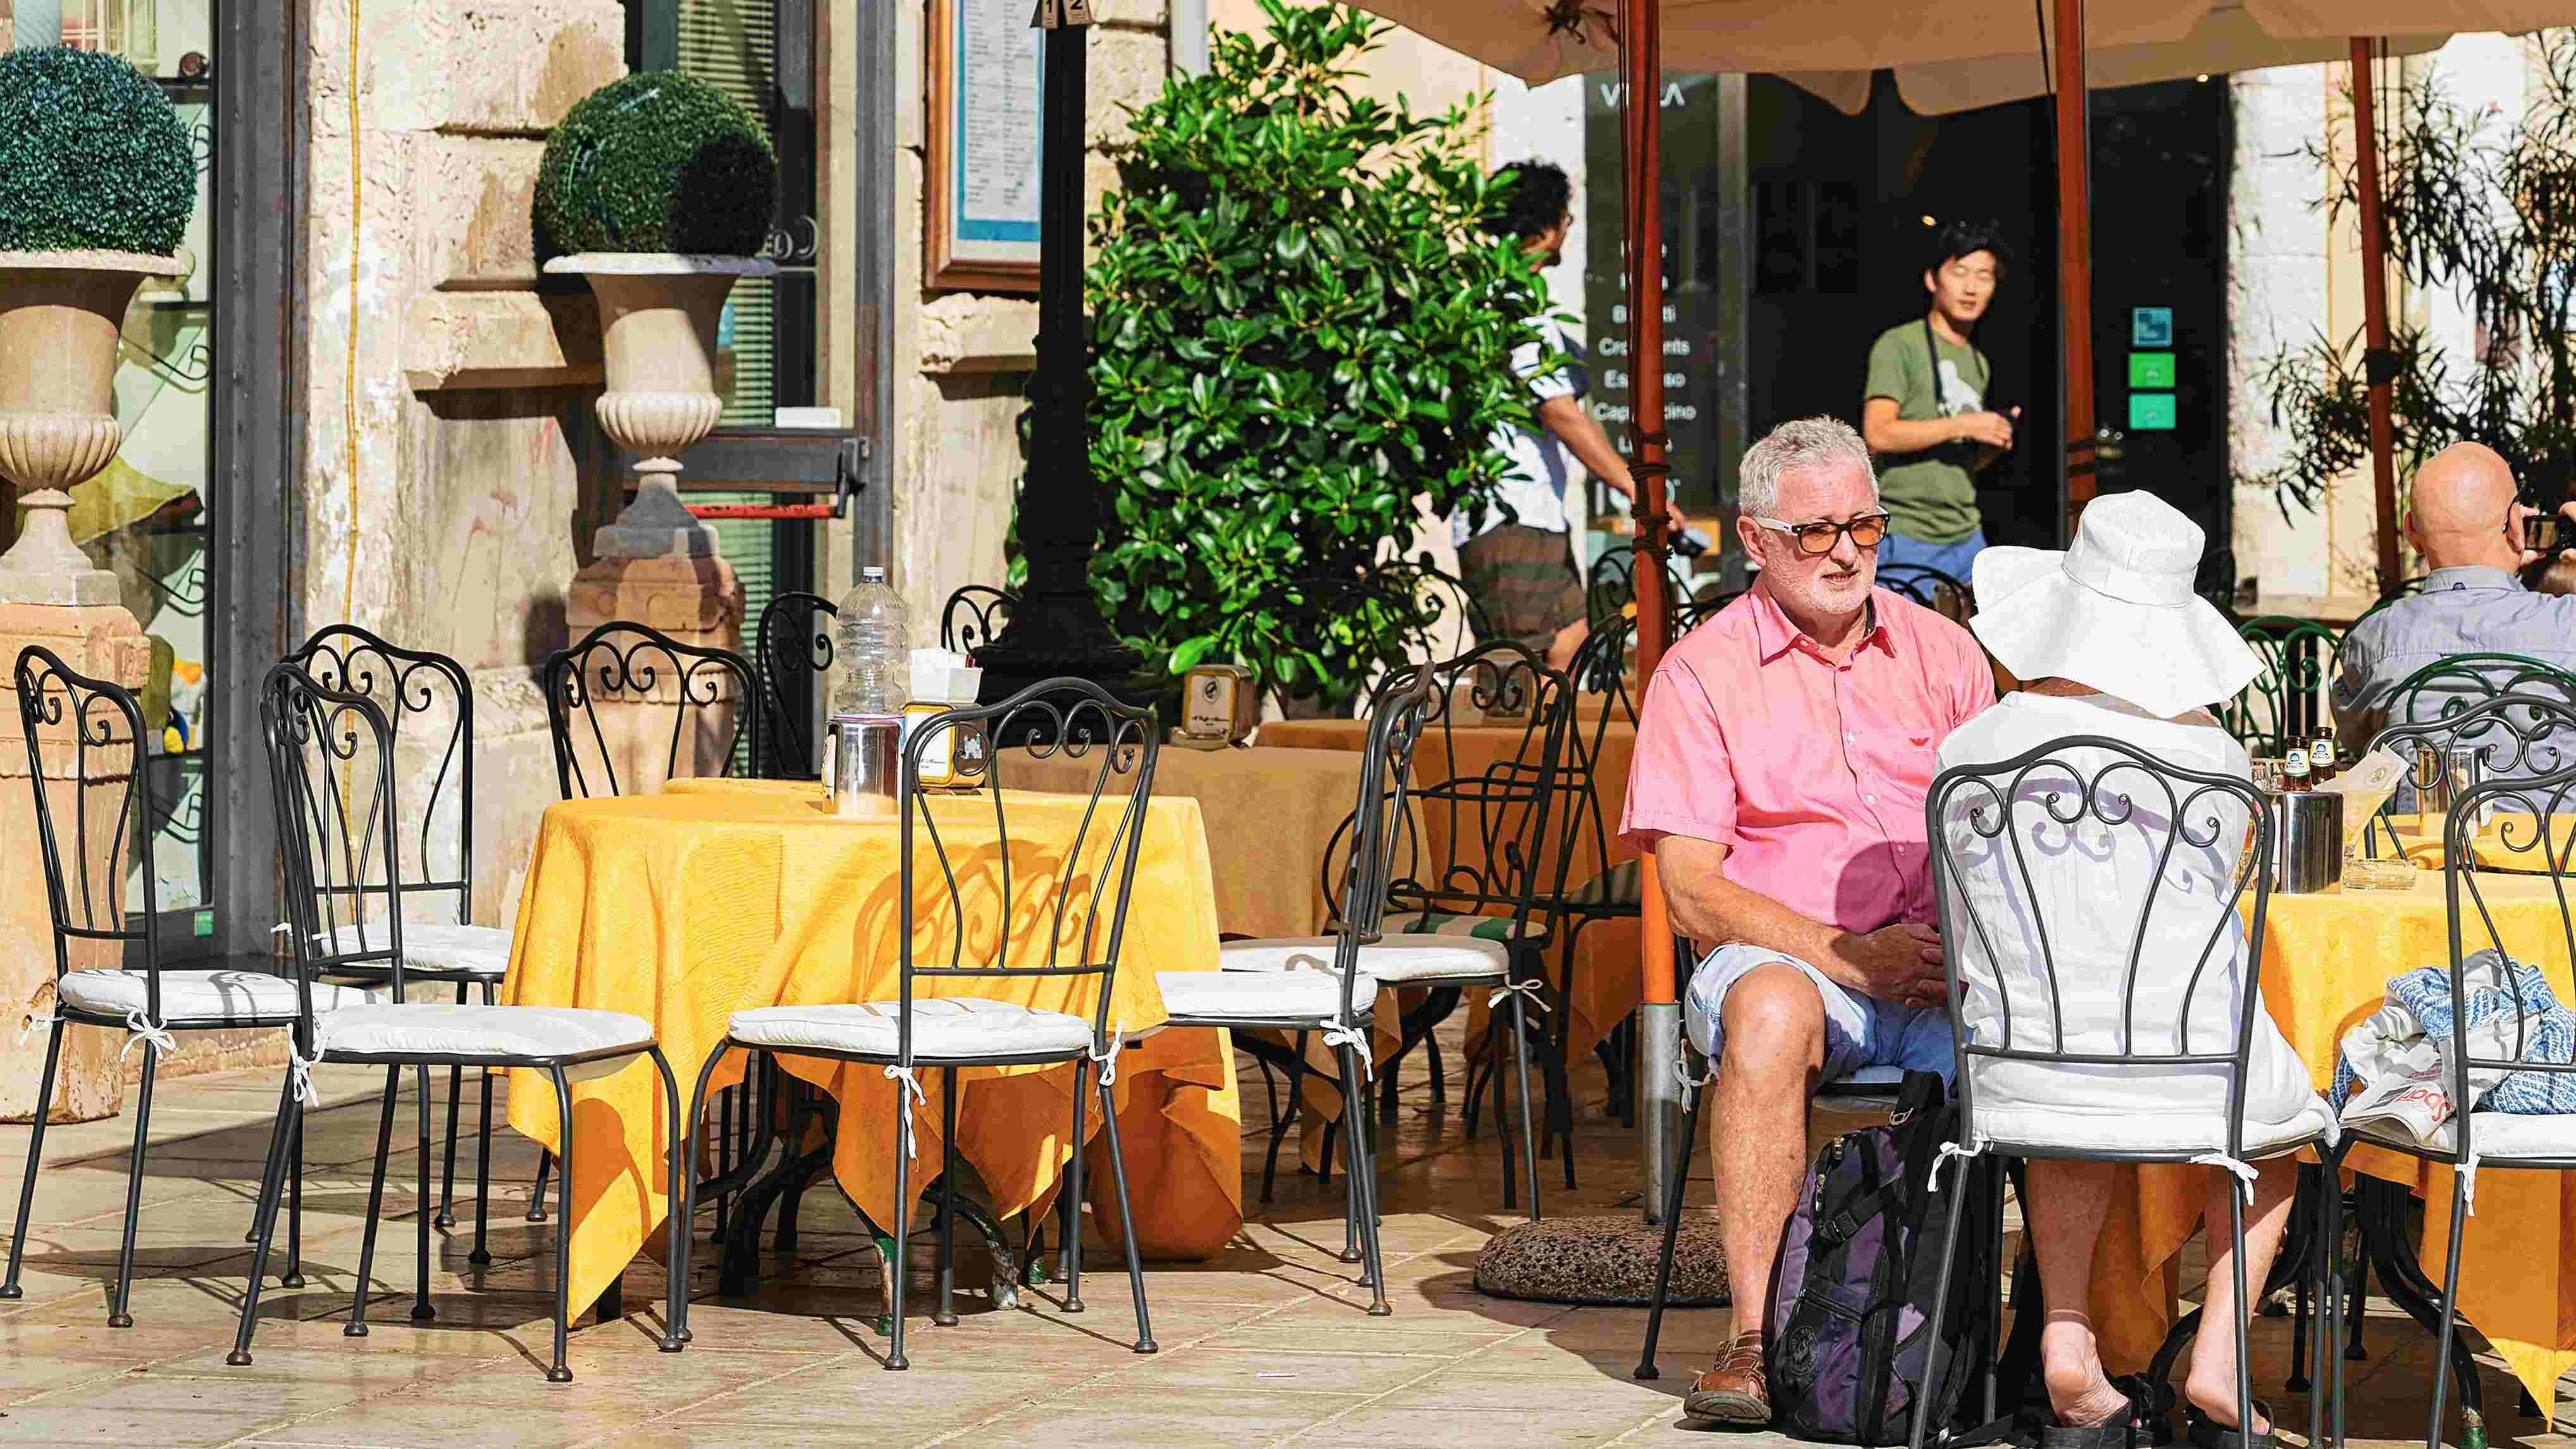 Cop crackdown: Greek restaurants slammed for ripping off tourists